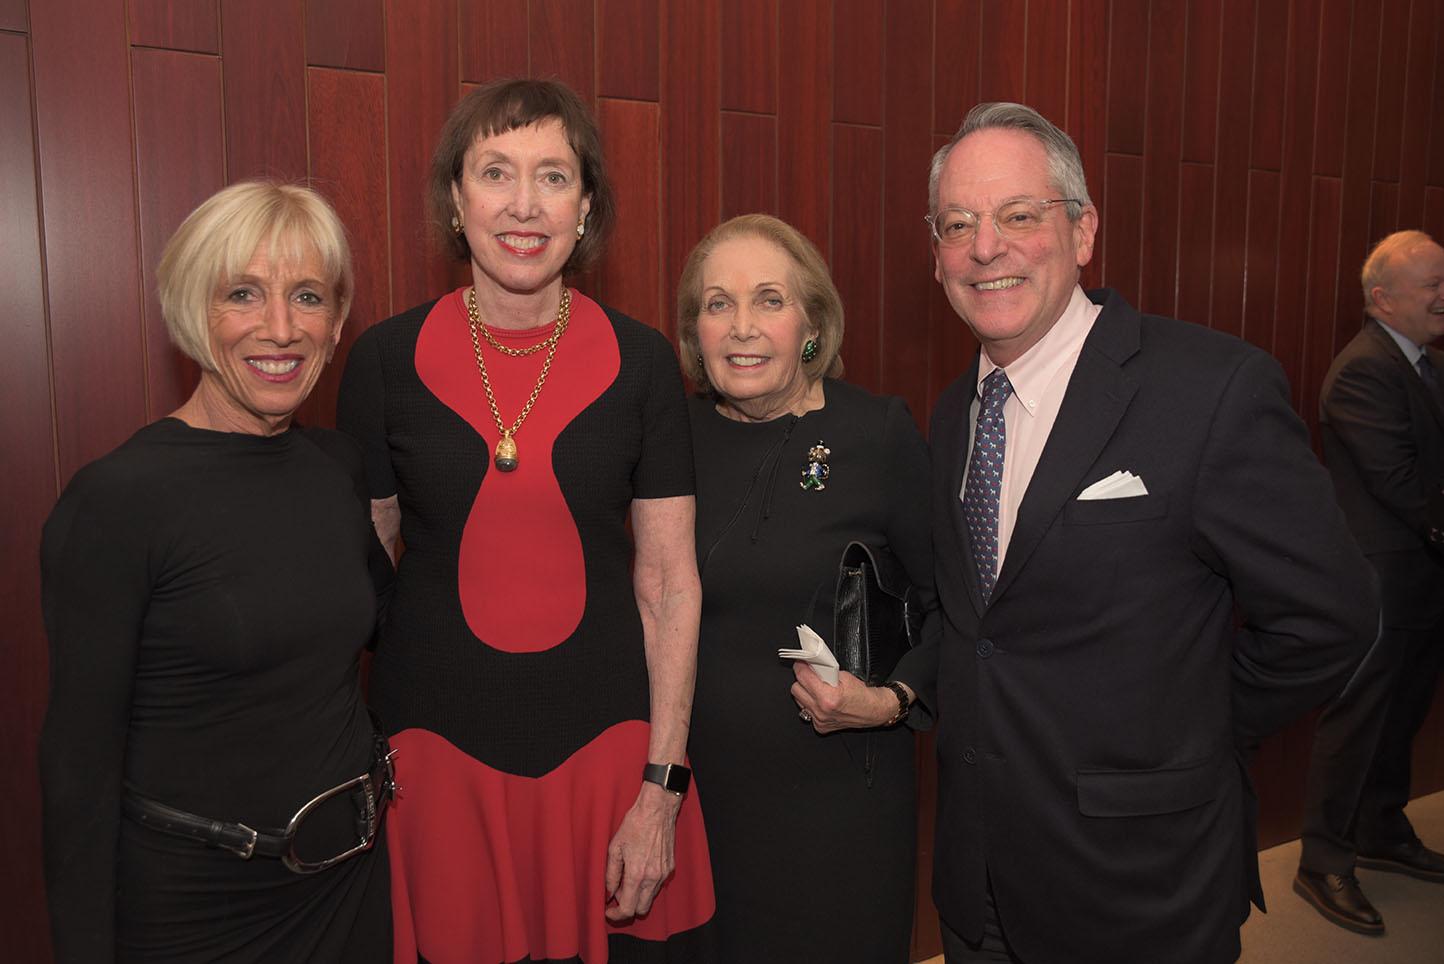 CMS Board member Vicki Kellogg, CMS Executive Director Suzanne Davidson, Alice Netter, Ken Wyse